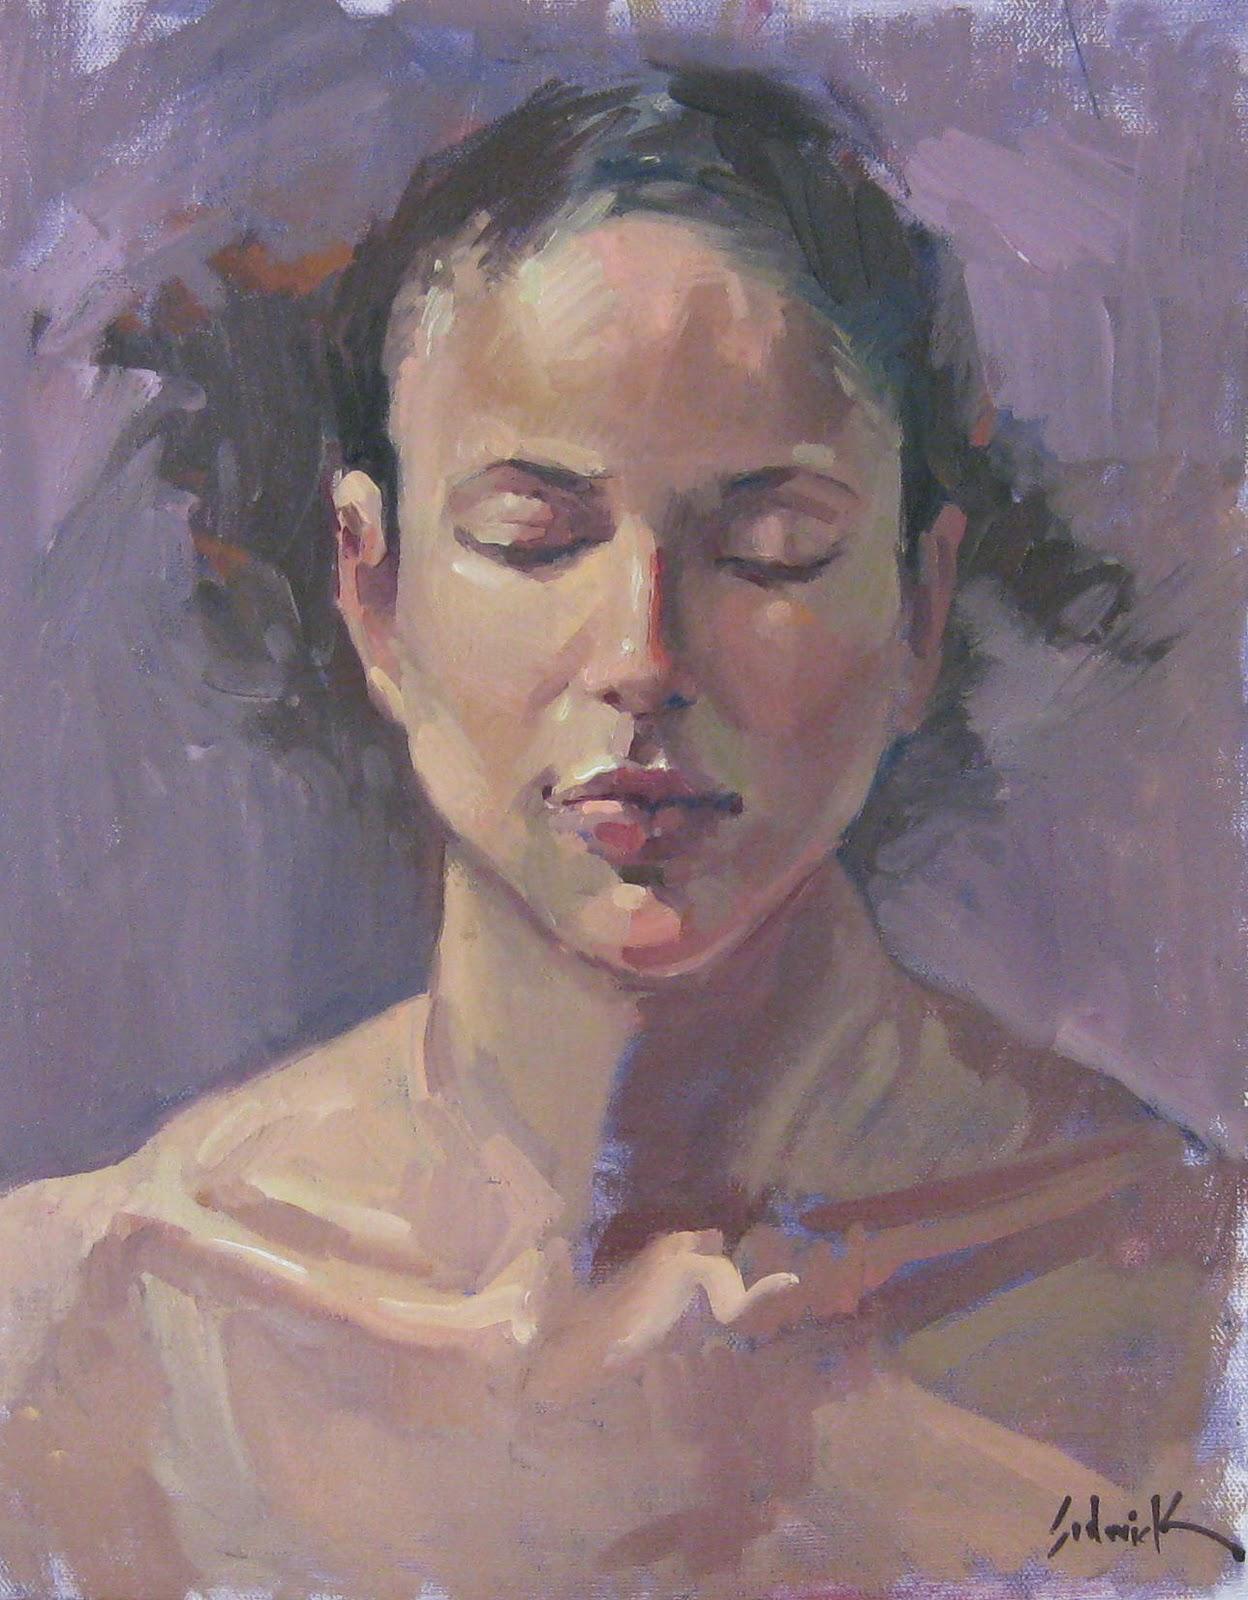 """Reverie - Portrait painting by Sarah Sedwick"" original fine art by Sarah Sedwick"